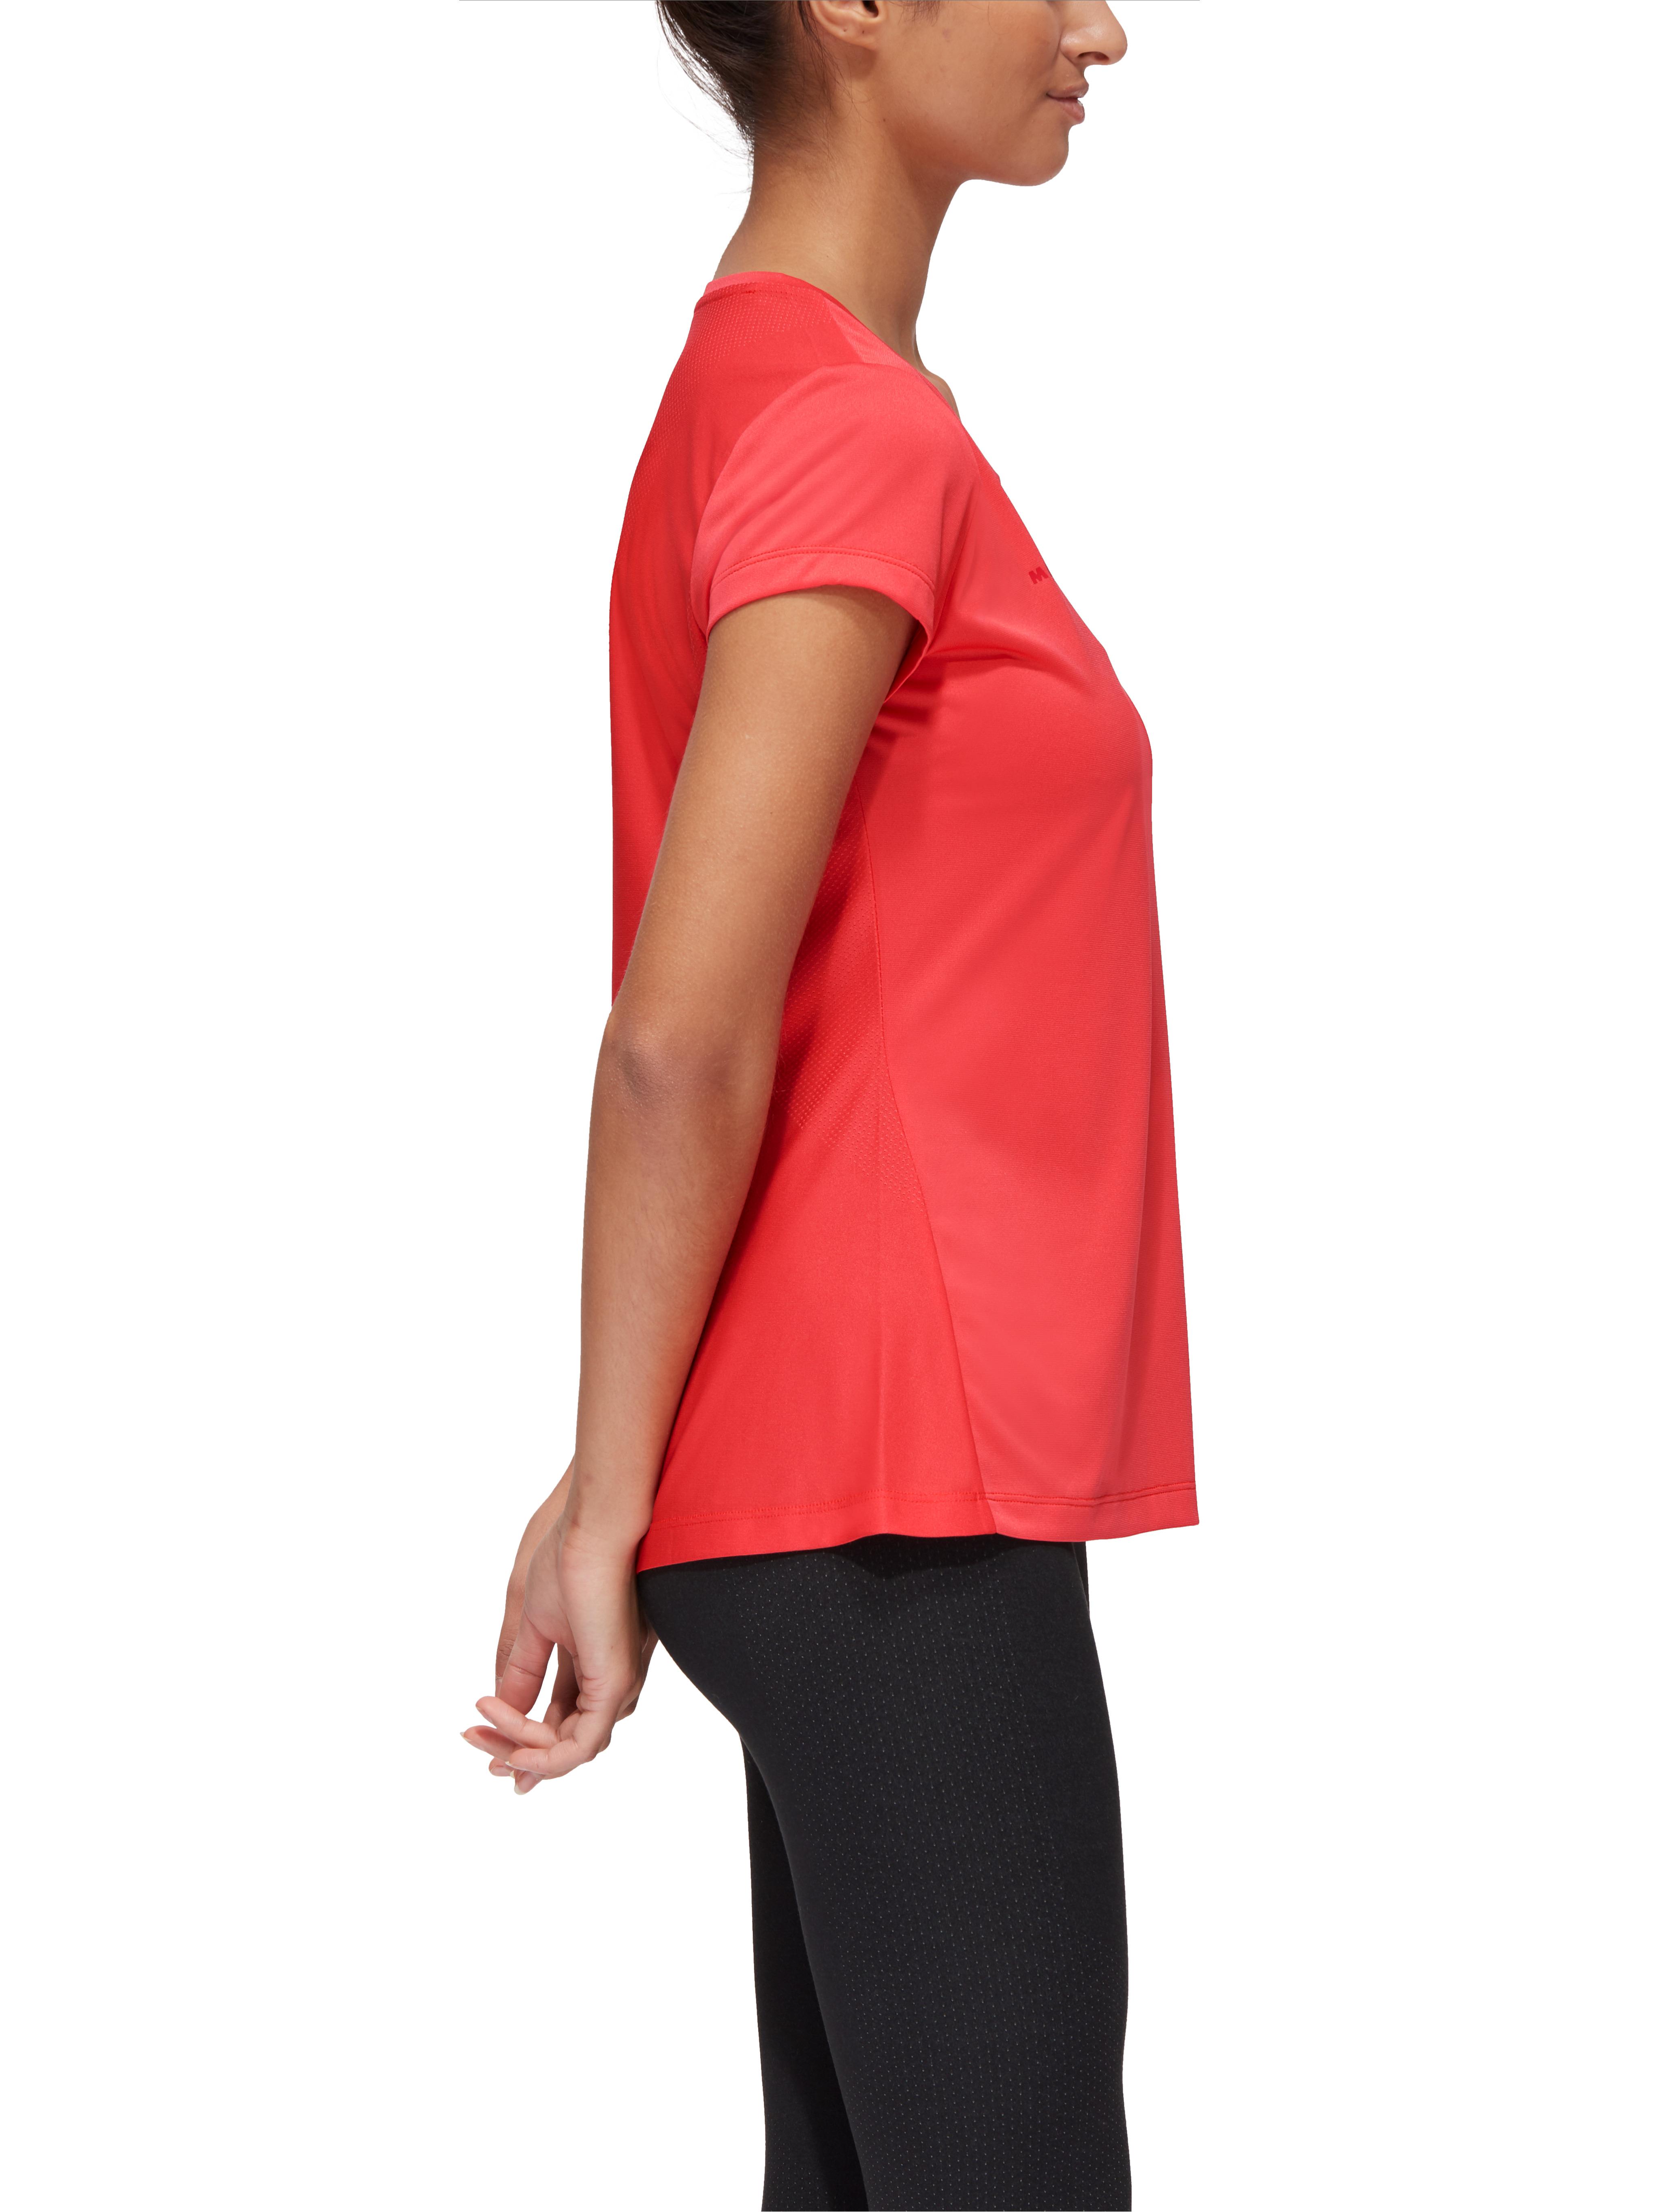 Crashiano T-Shirt Women product image